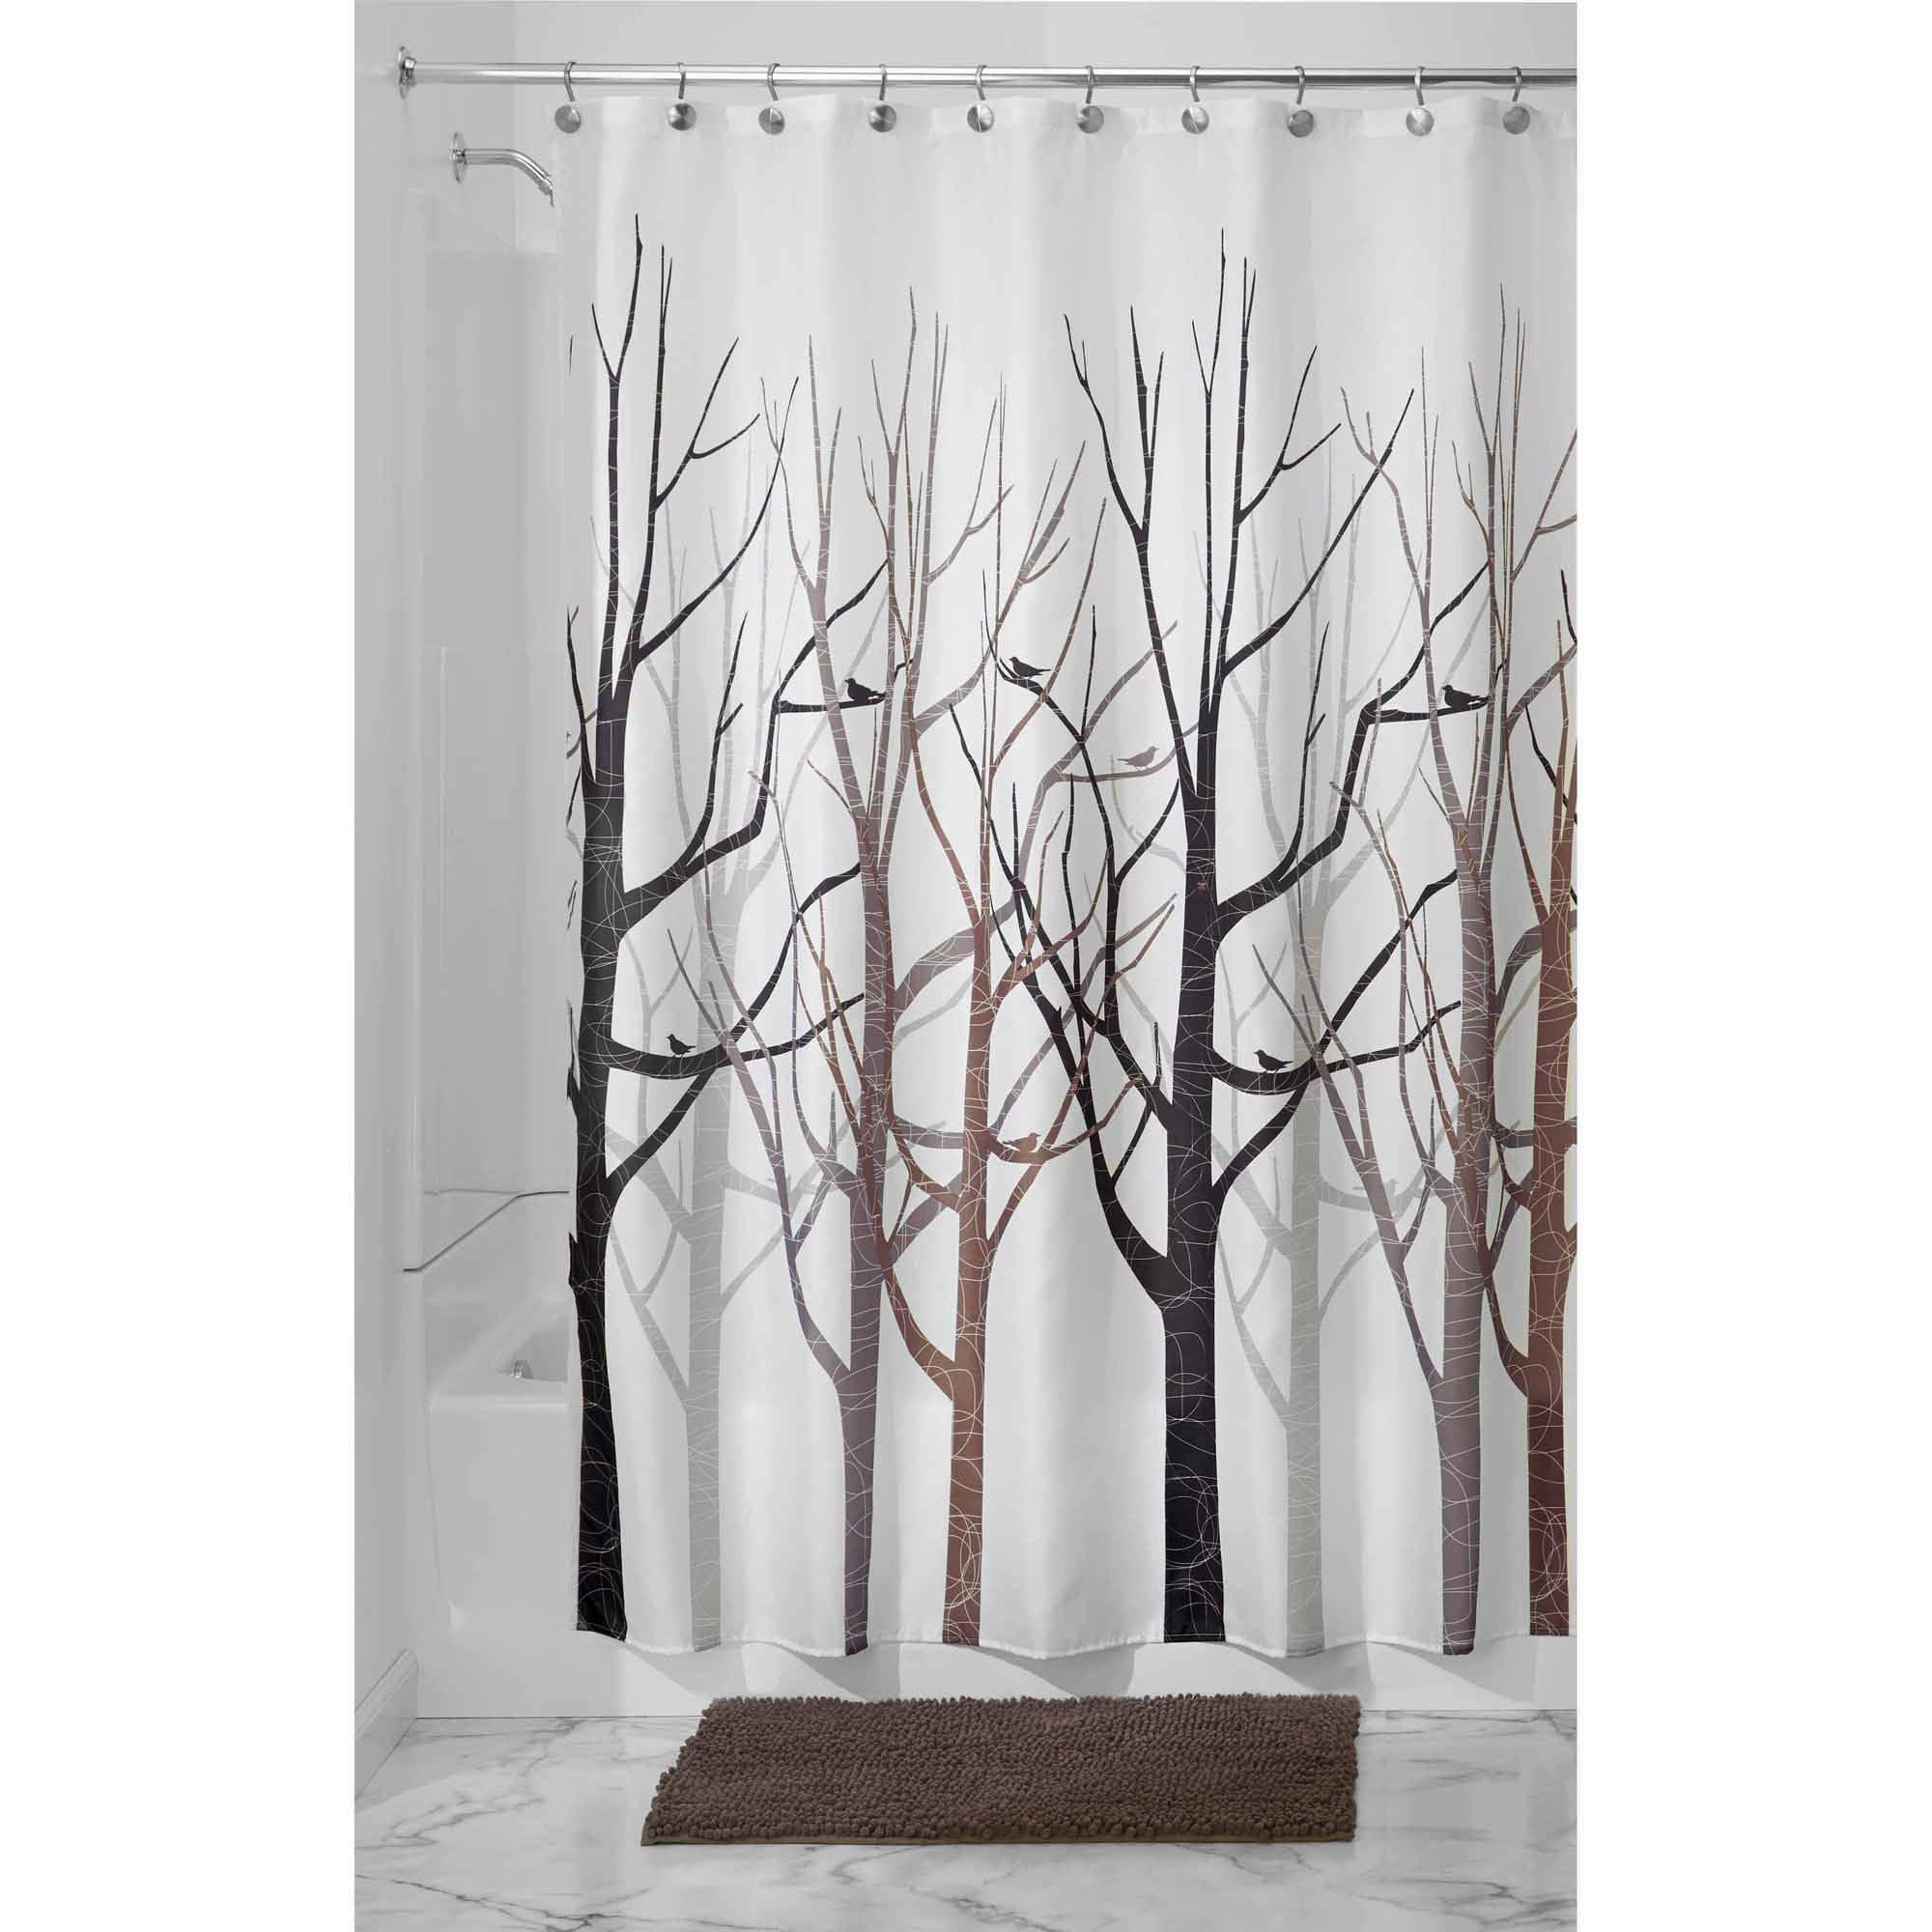 "InterDesign Forest Fabric Shower Curtain, 72"" x 72"", Black/Gray"